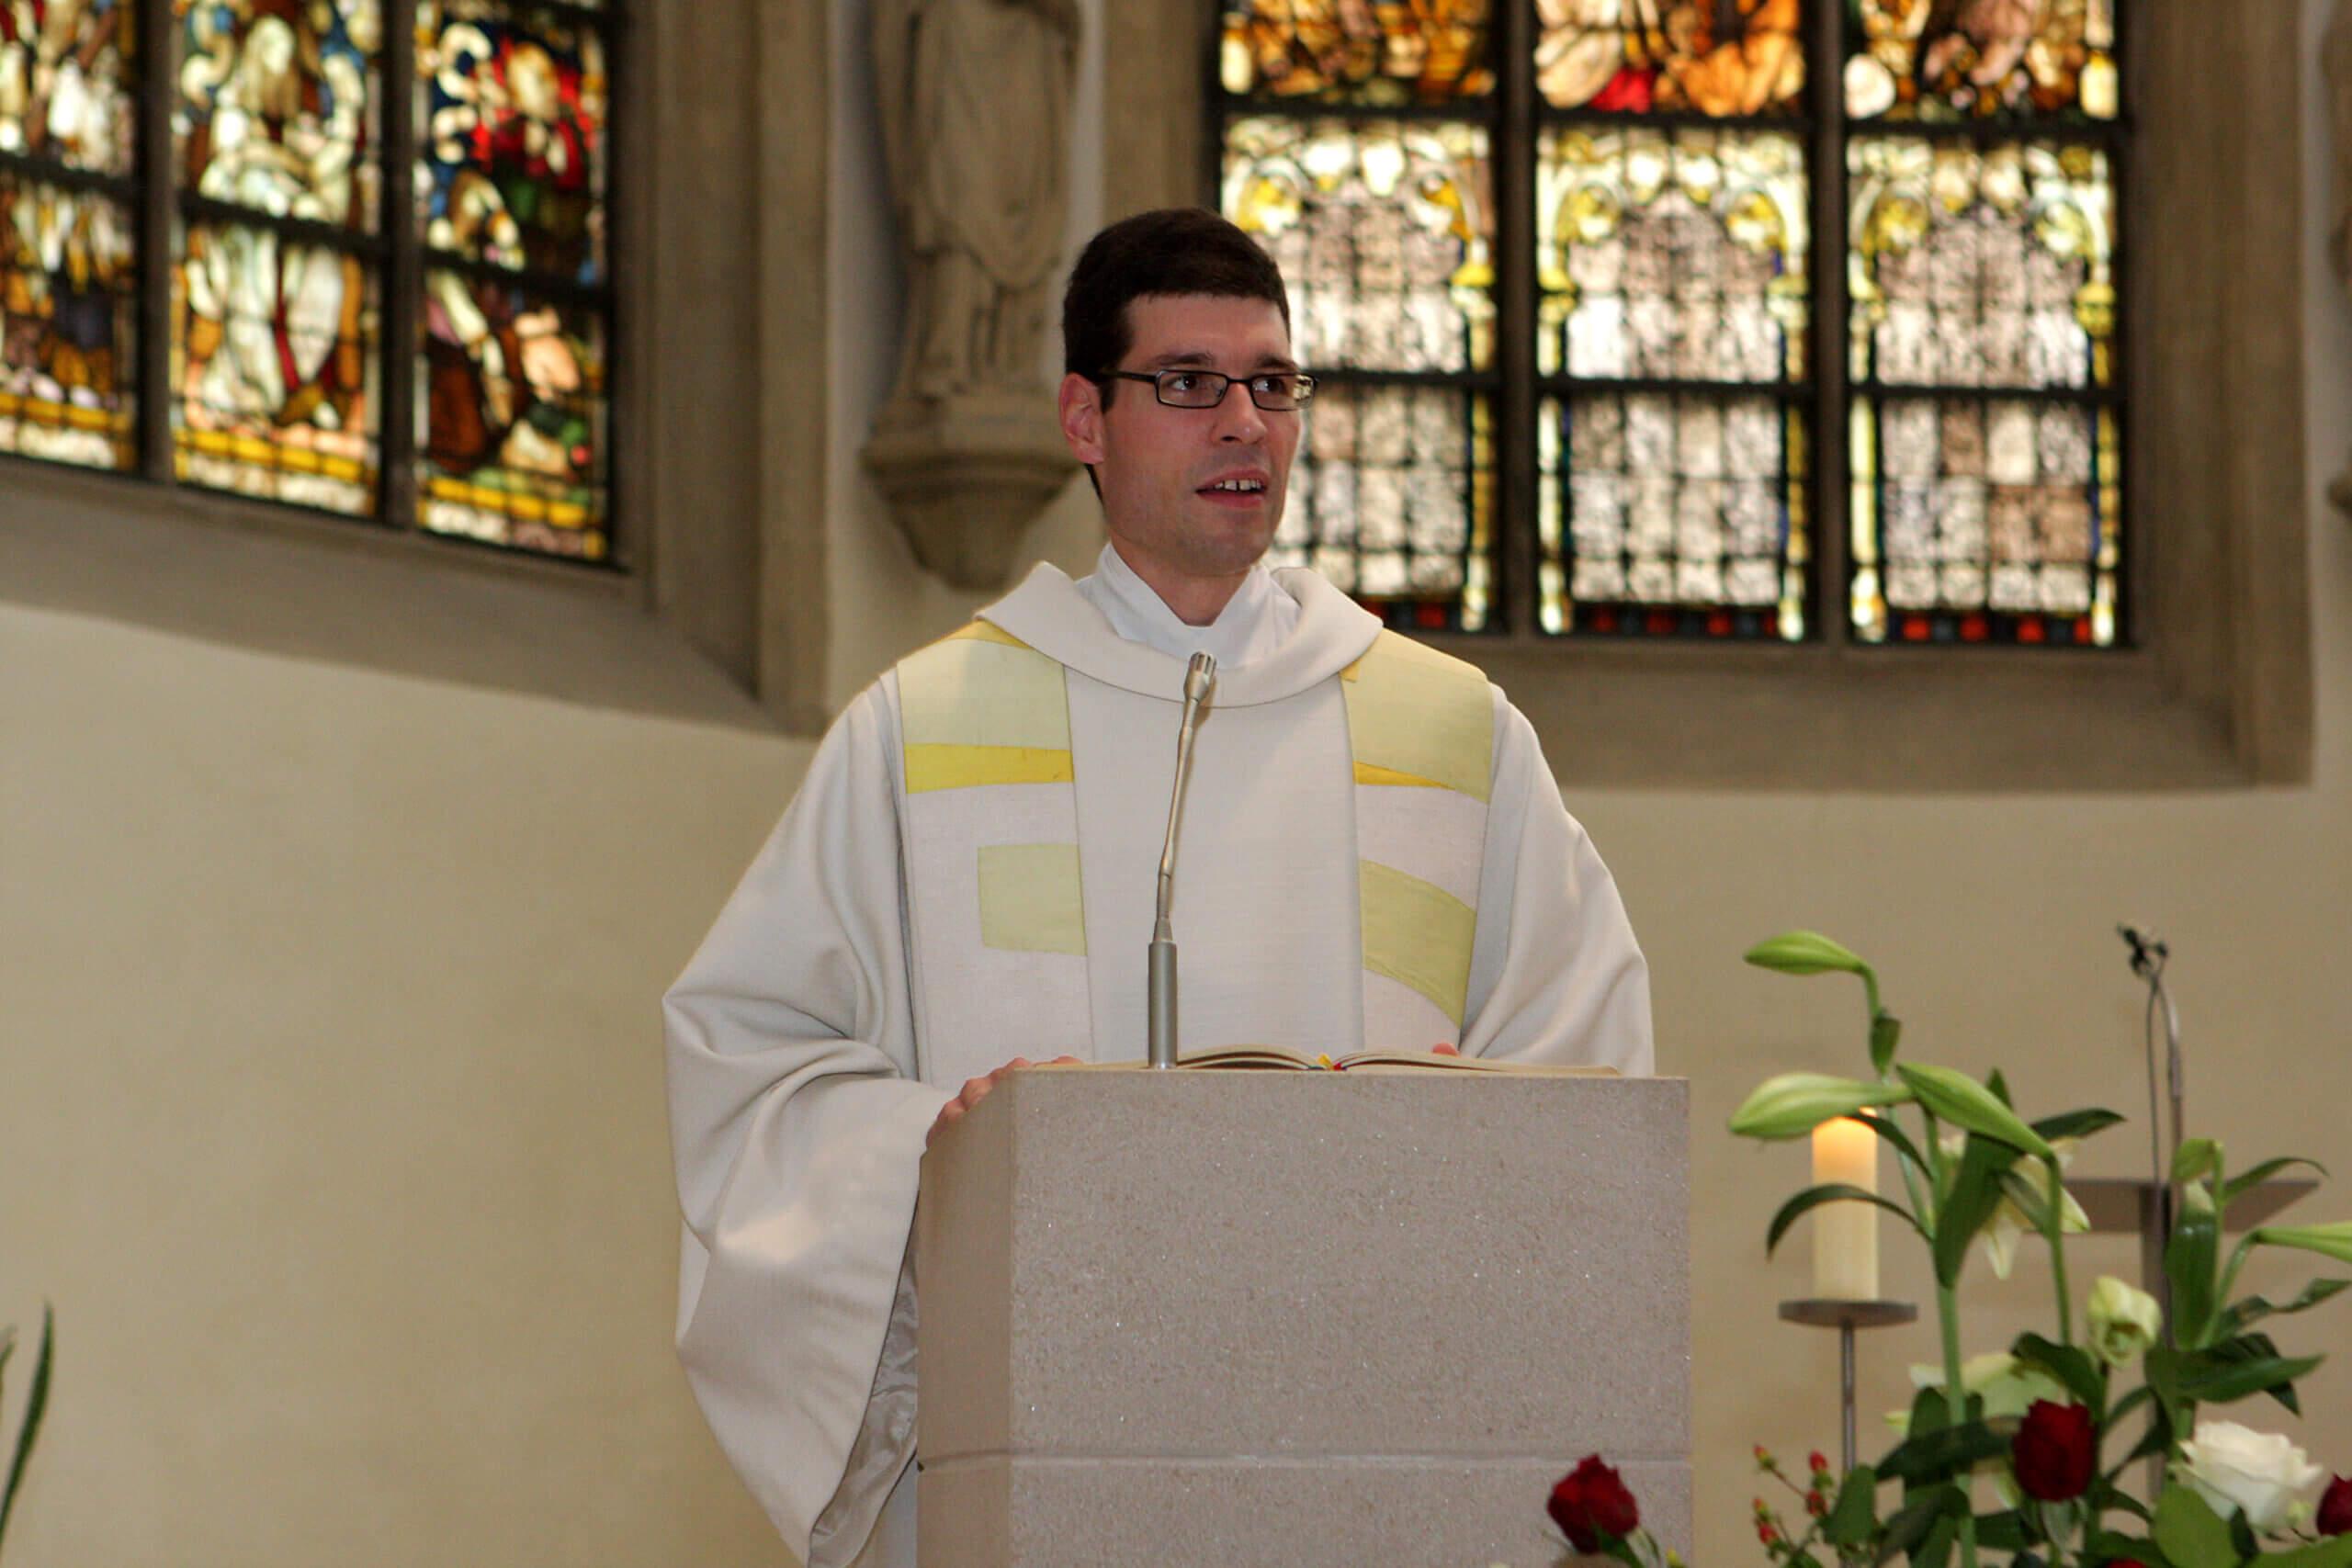 Stefan Hörstrup in der St. Christophorus Kirche - als